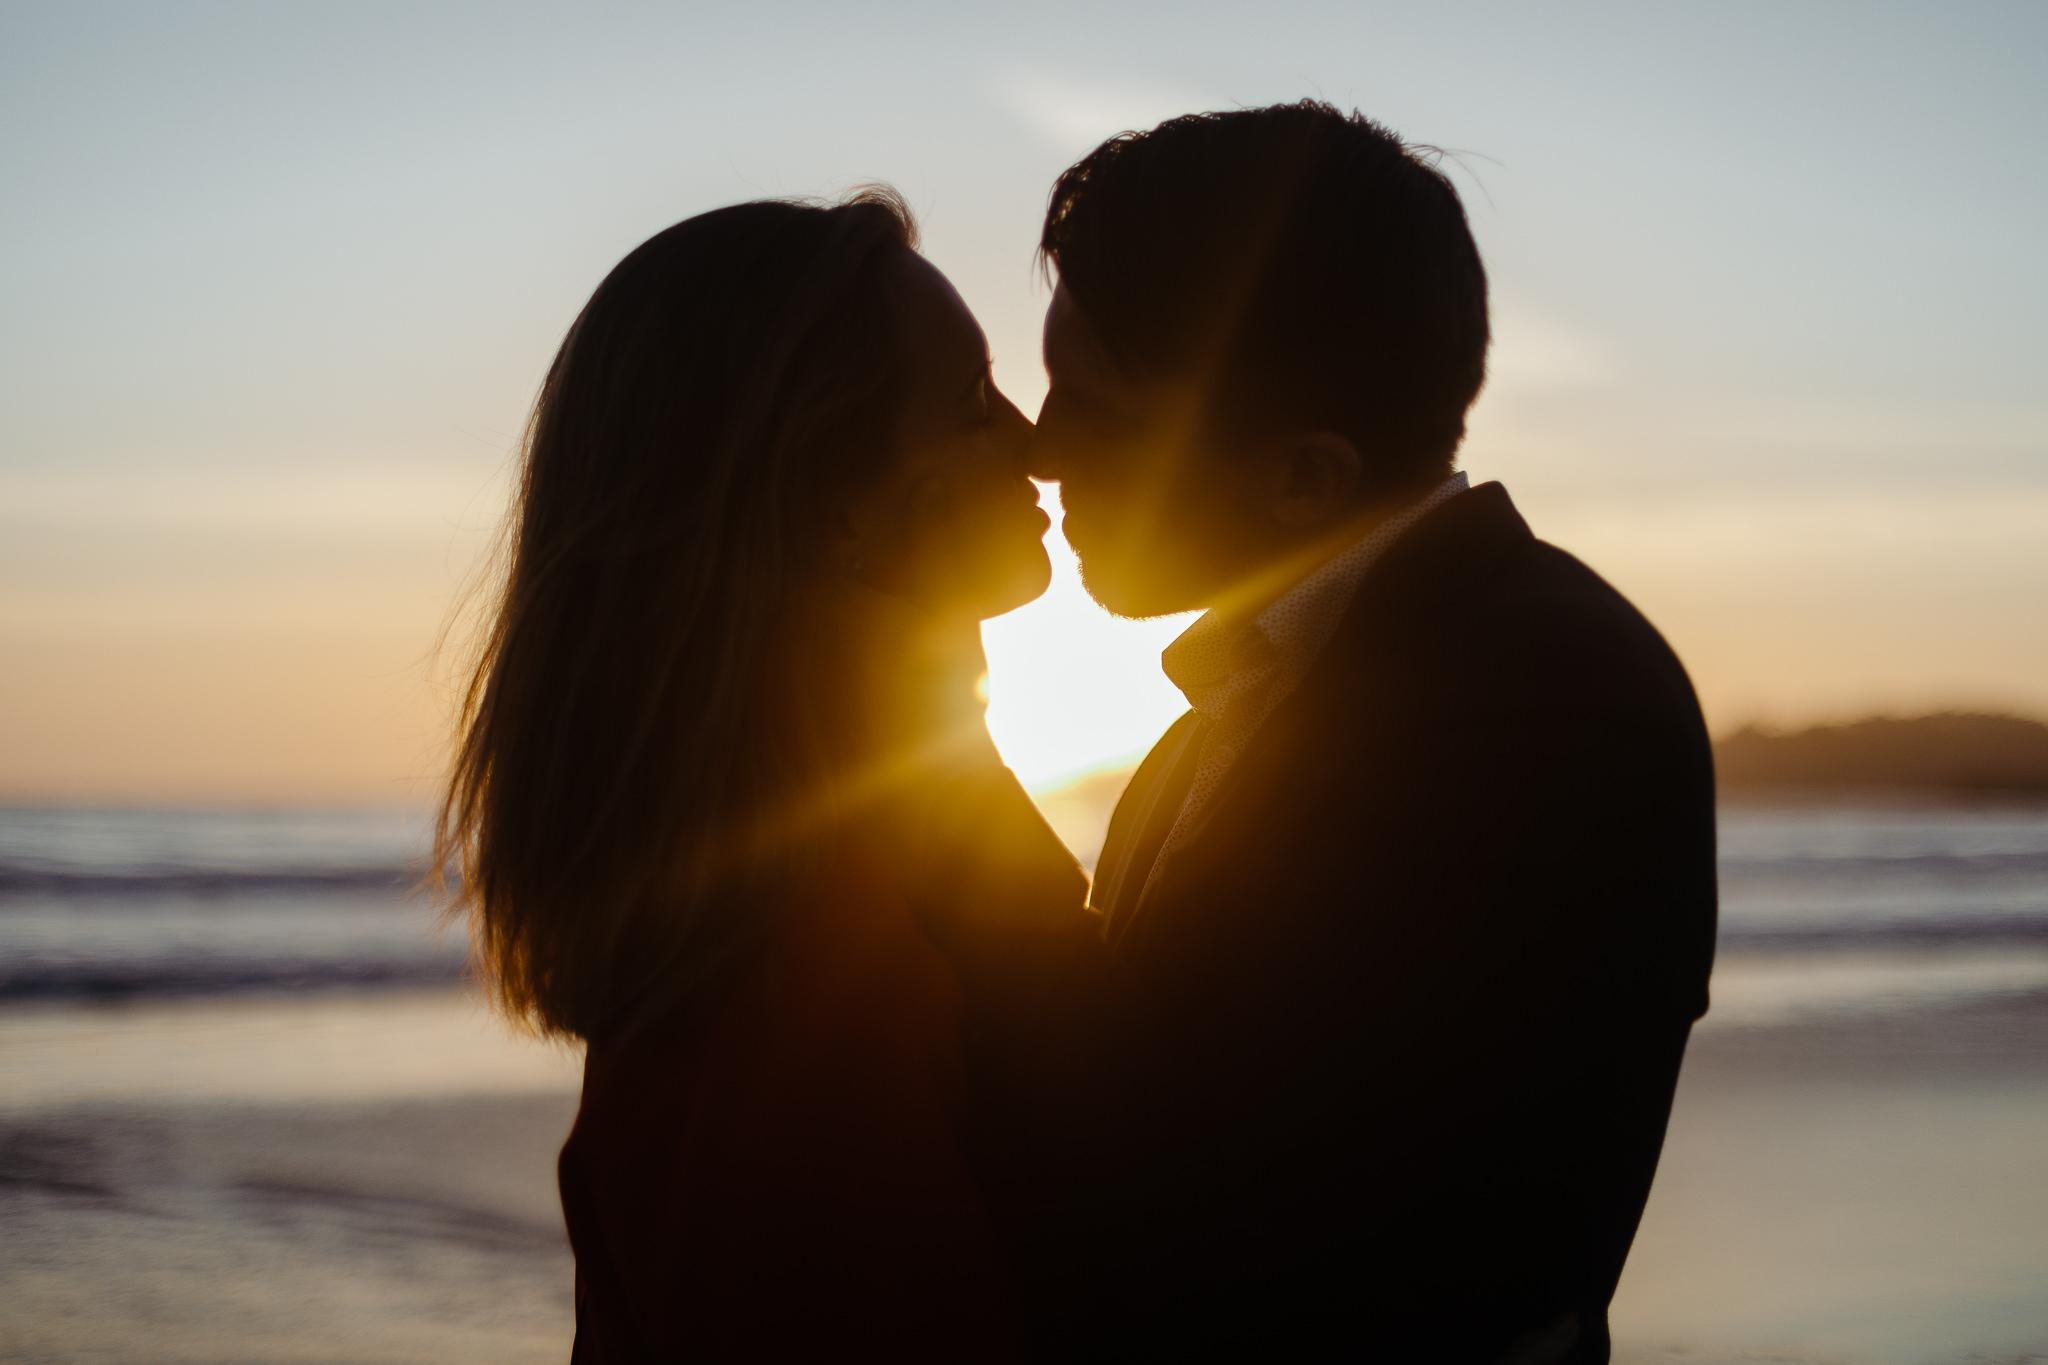 Archer Inspired Photography Carmel Beach California Wedding Engagement Lifestyle Anniversary Natural Light Photographer-82.jpg